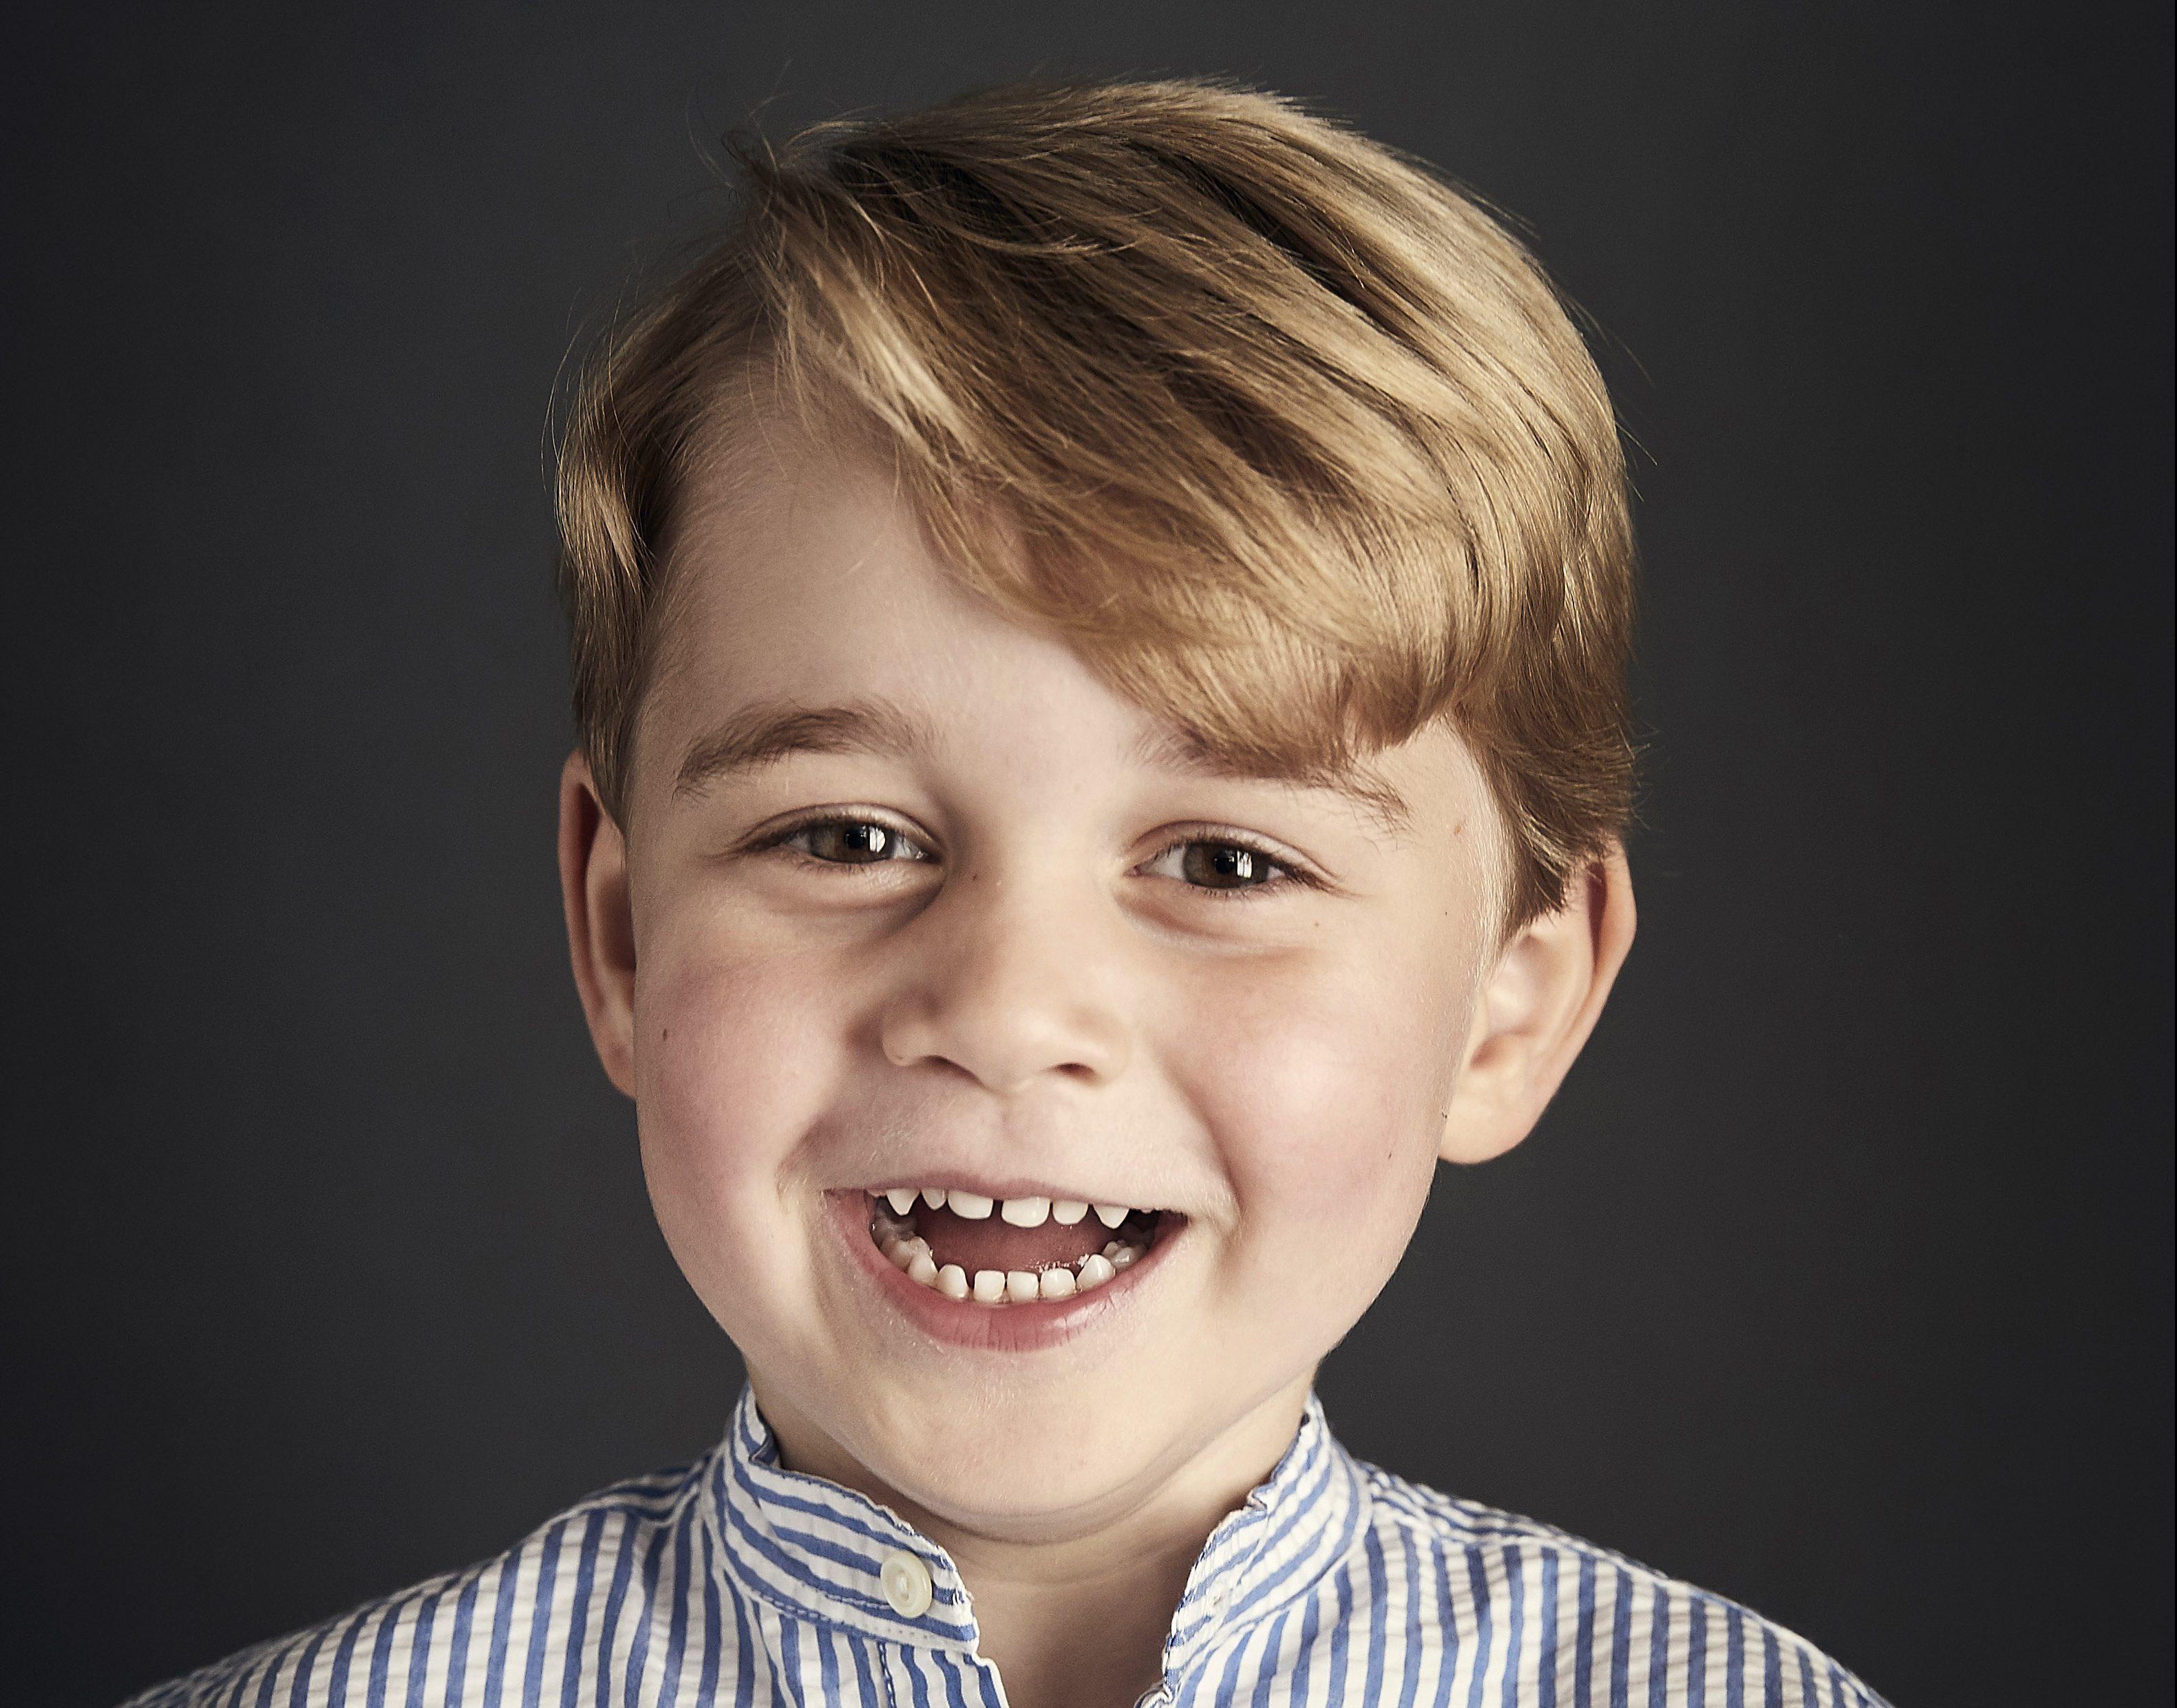 Картинки по запросу принц джордж